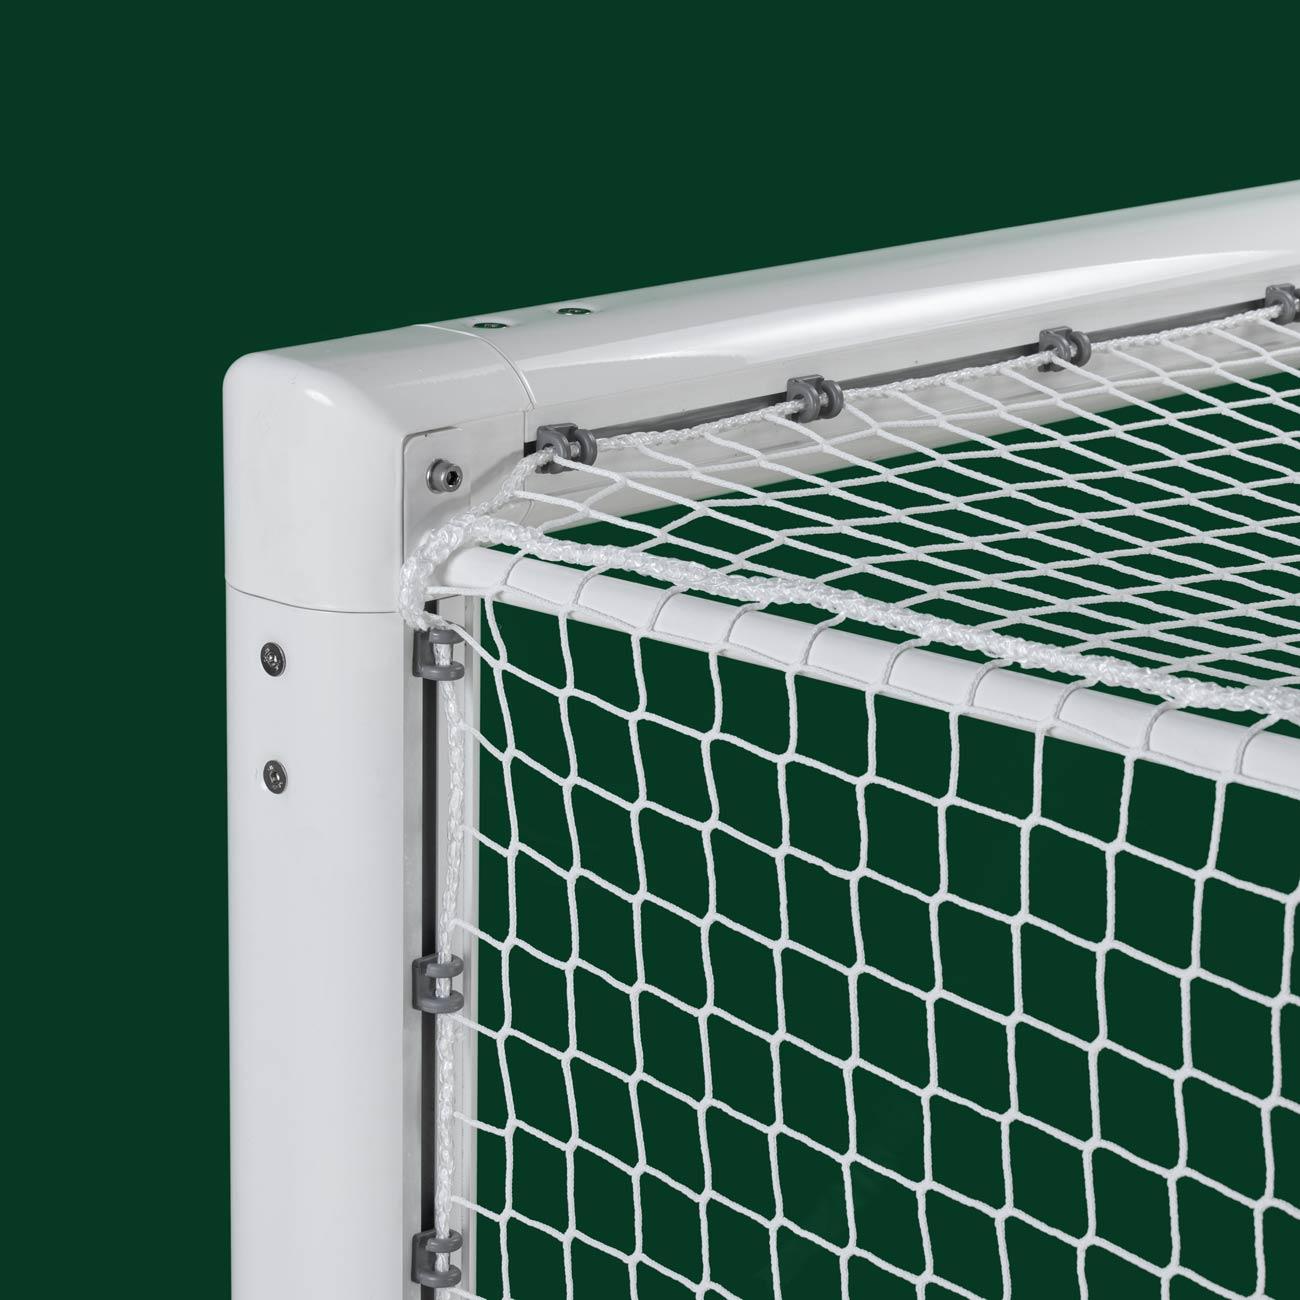 Netzhalter mit Doppelhaken